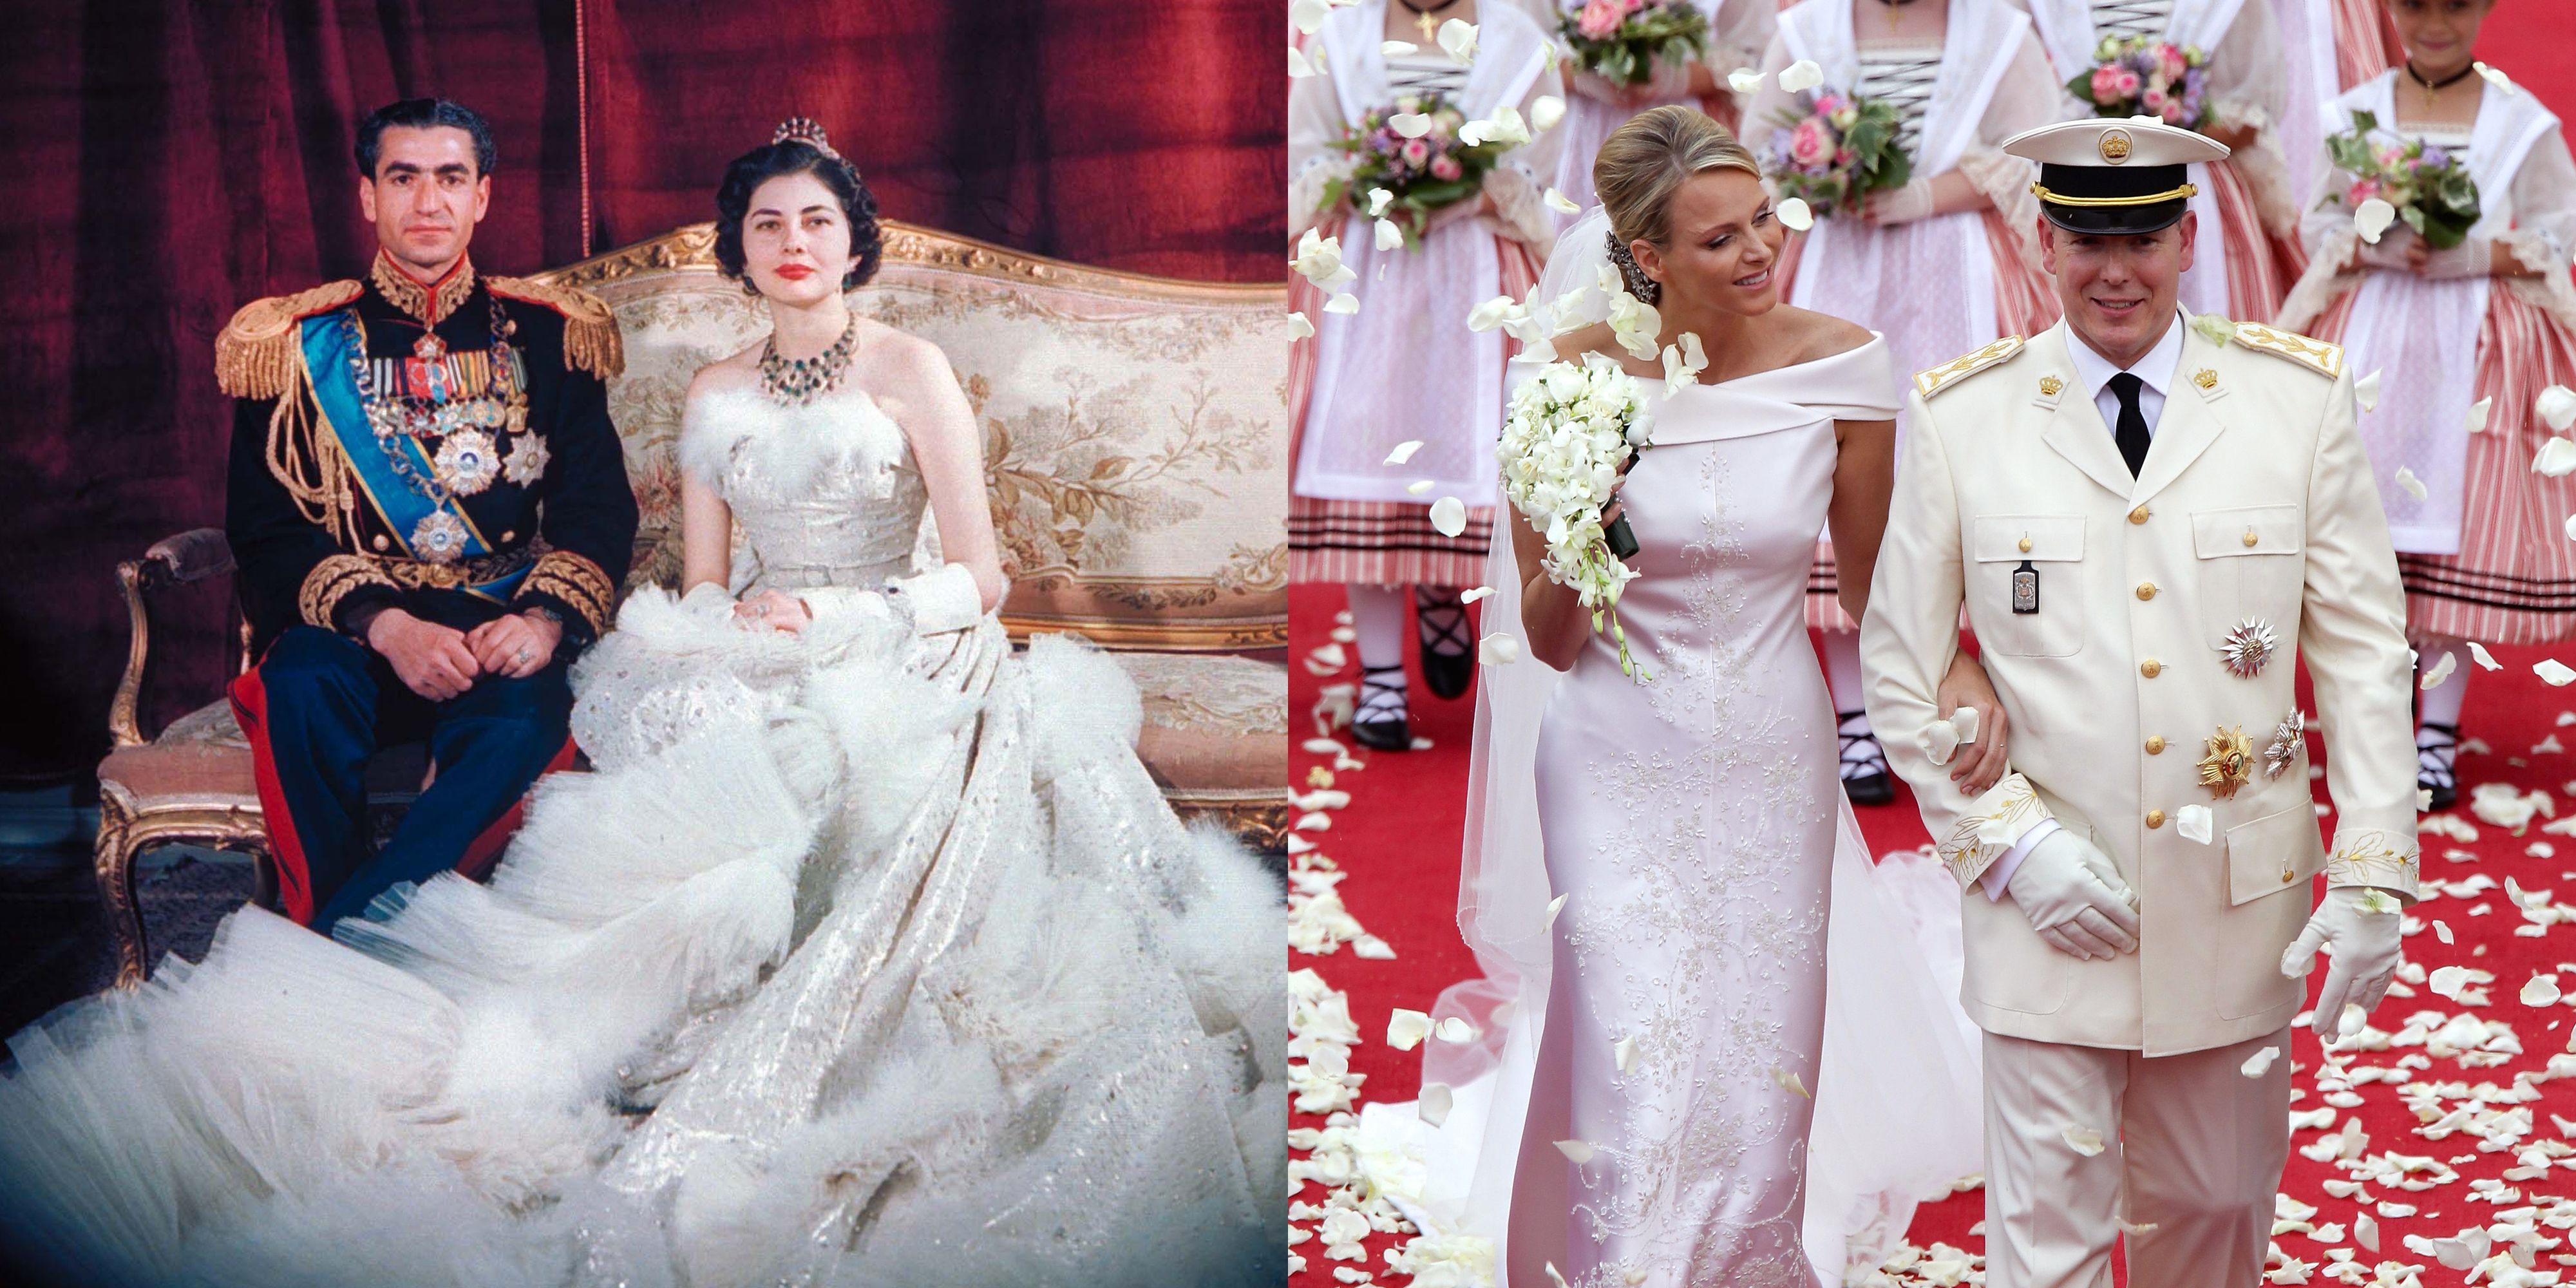 dresses of wedding